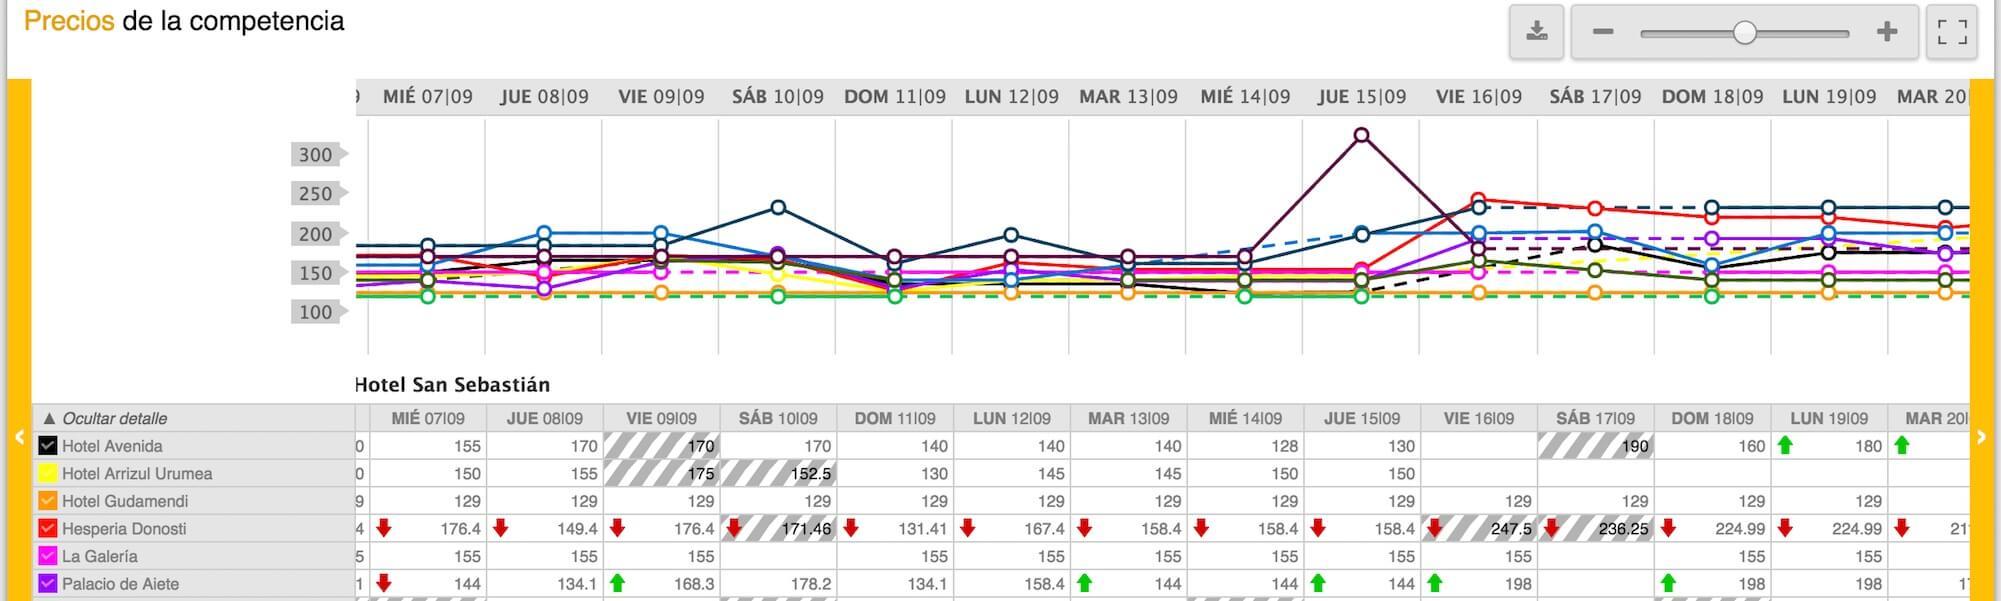 comparativa precios hoteles competidores competitive set